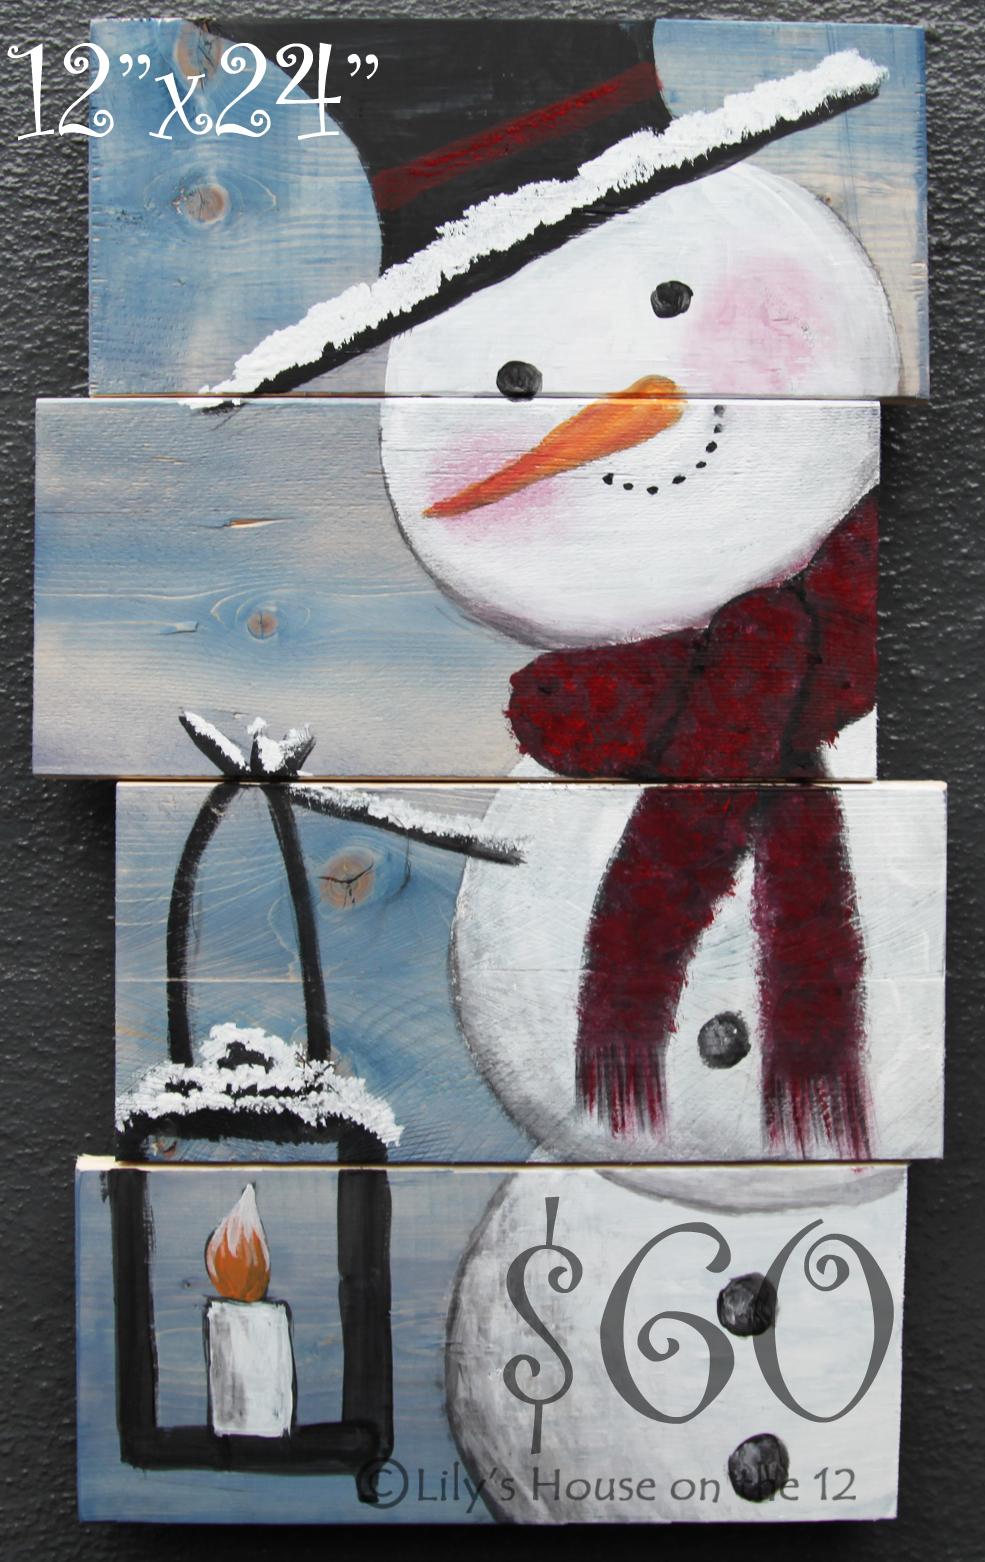 Snowman 12x24